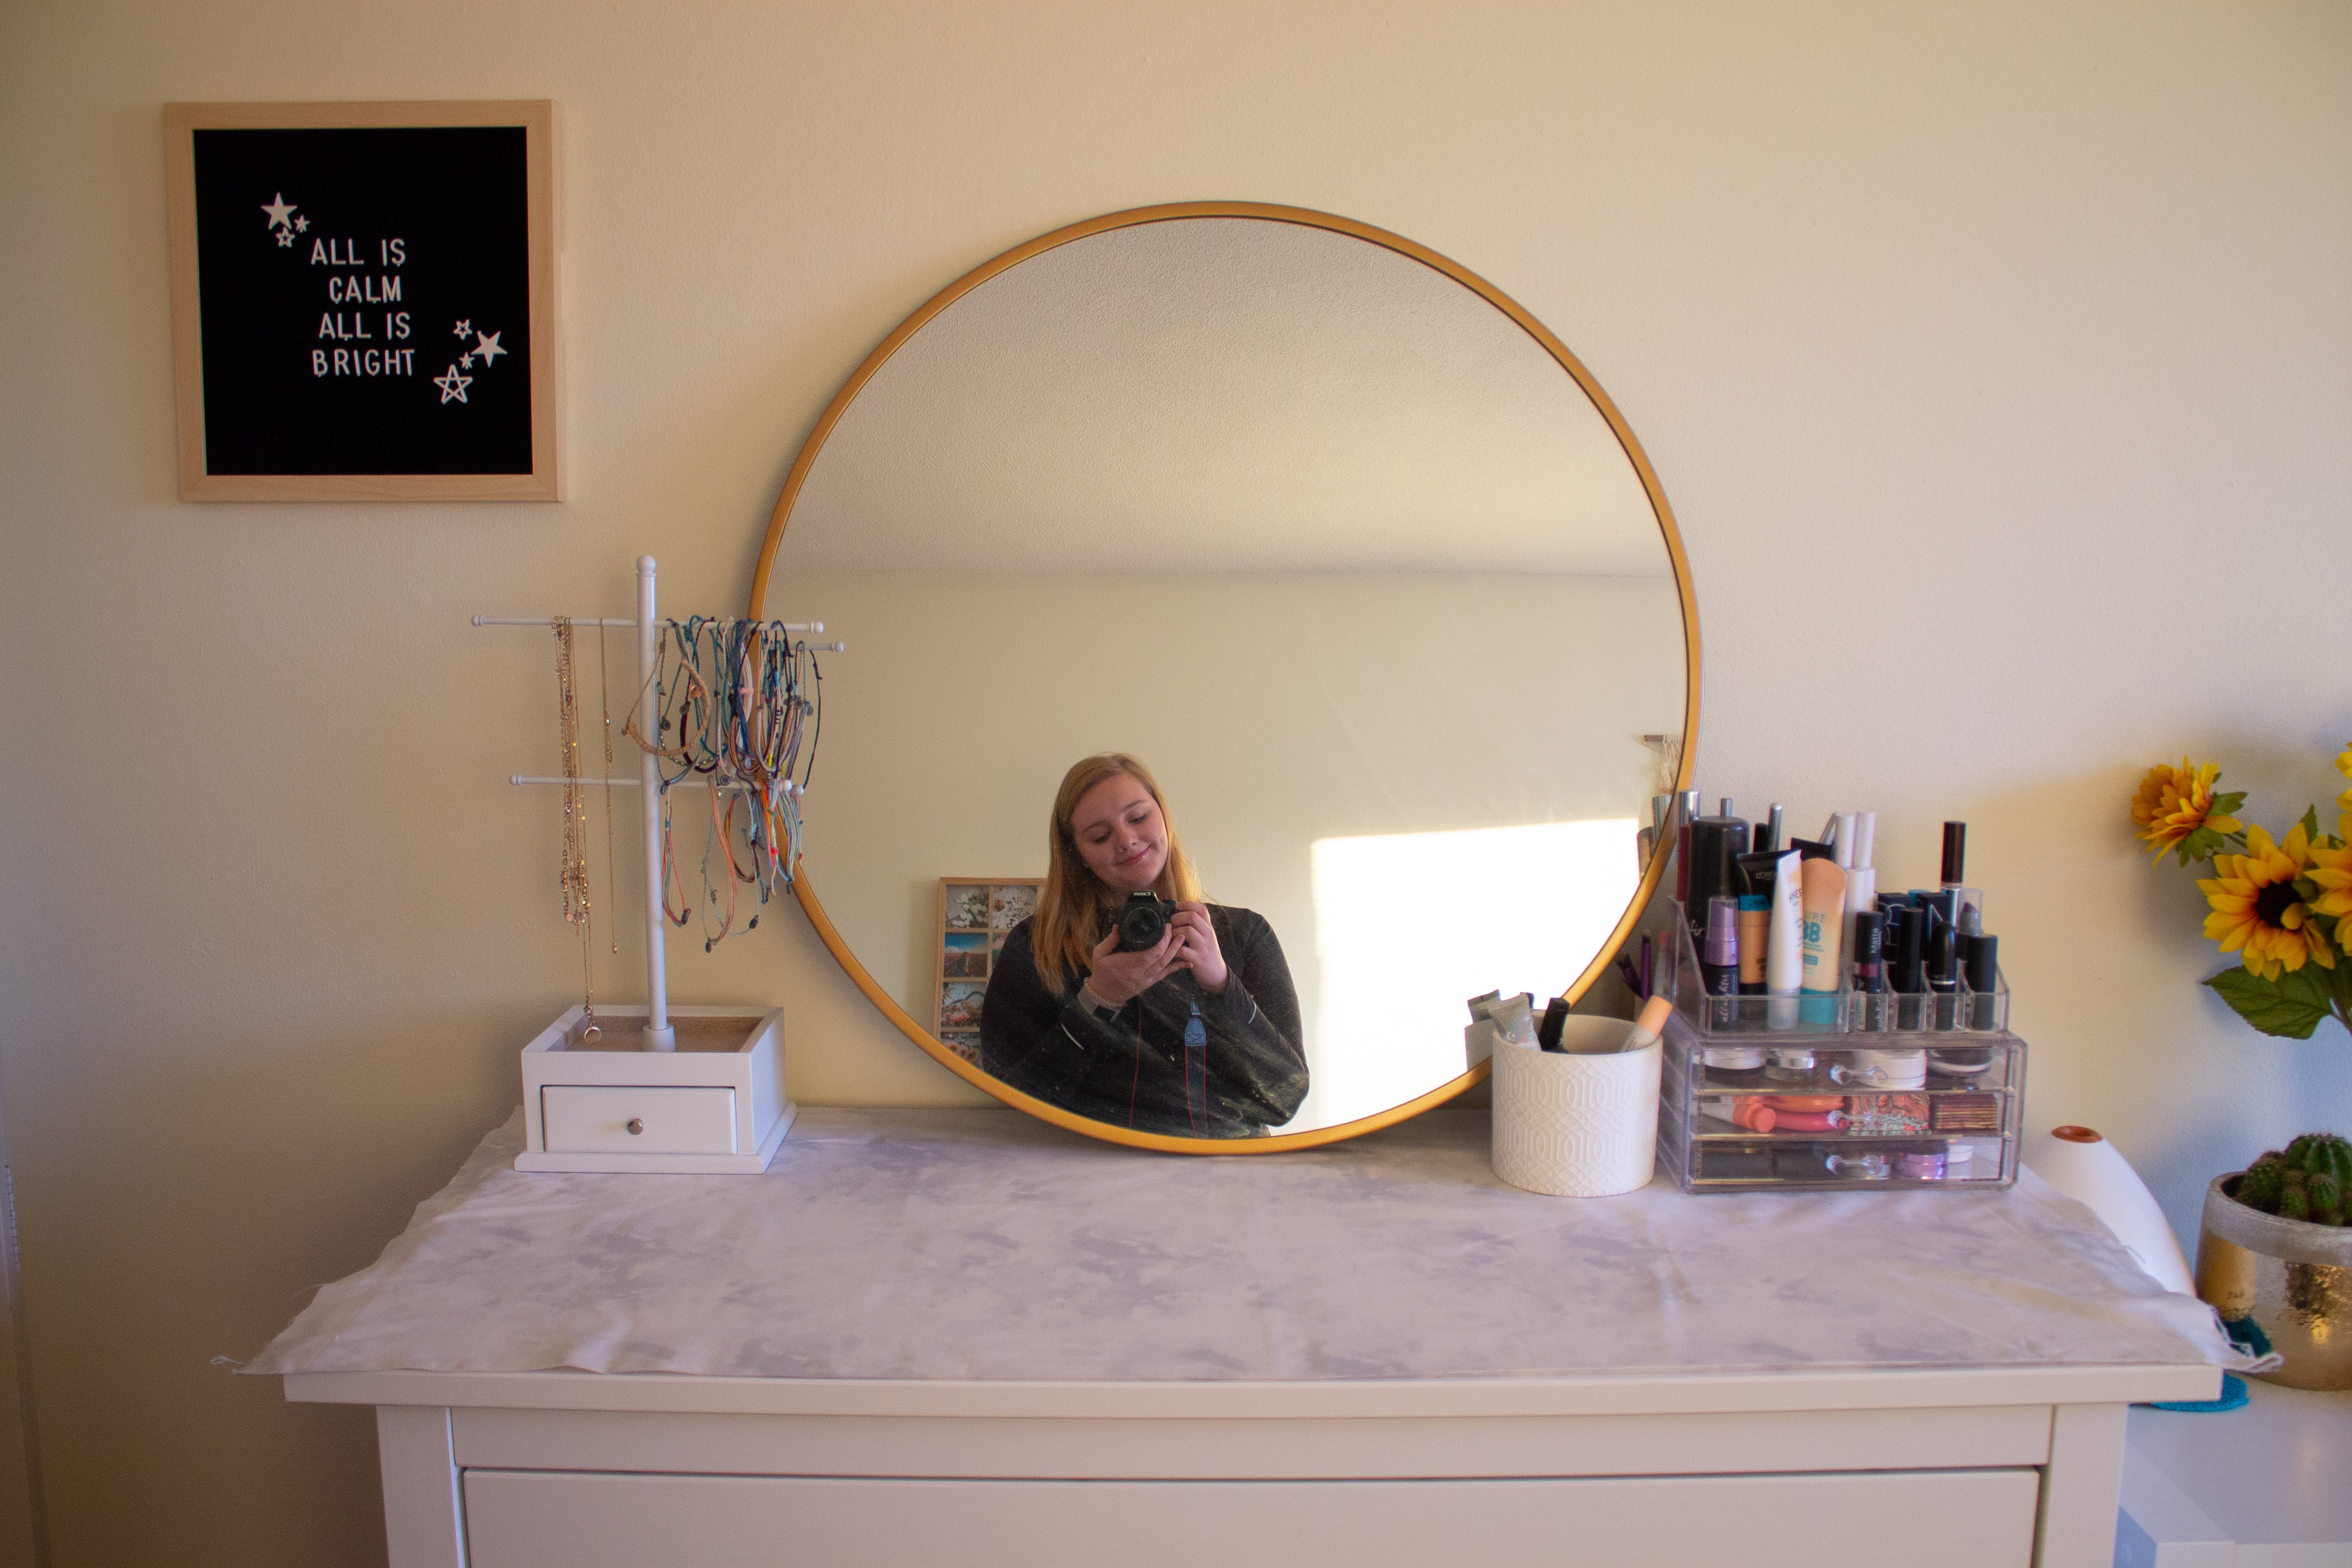 College Apartment Bedroom Tour | My Junior Year Room